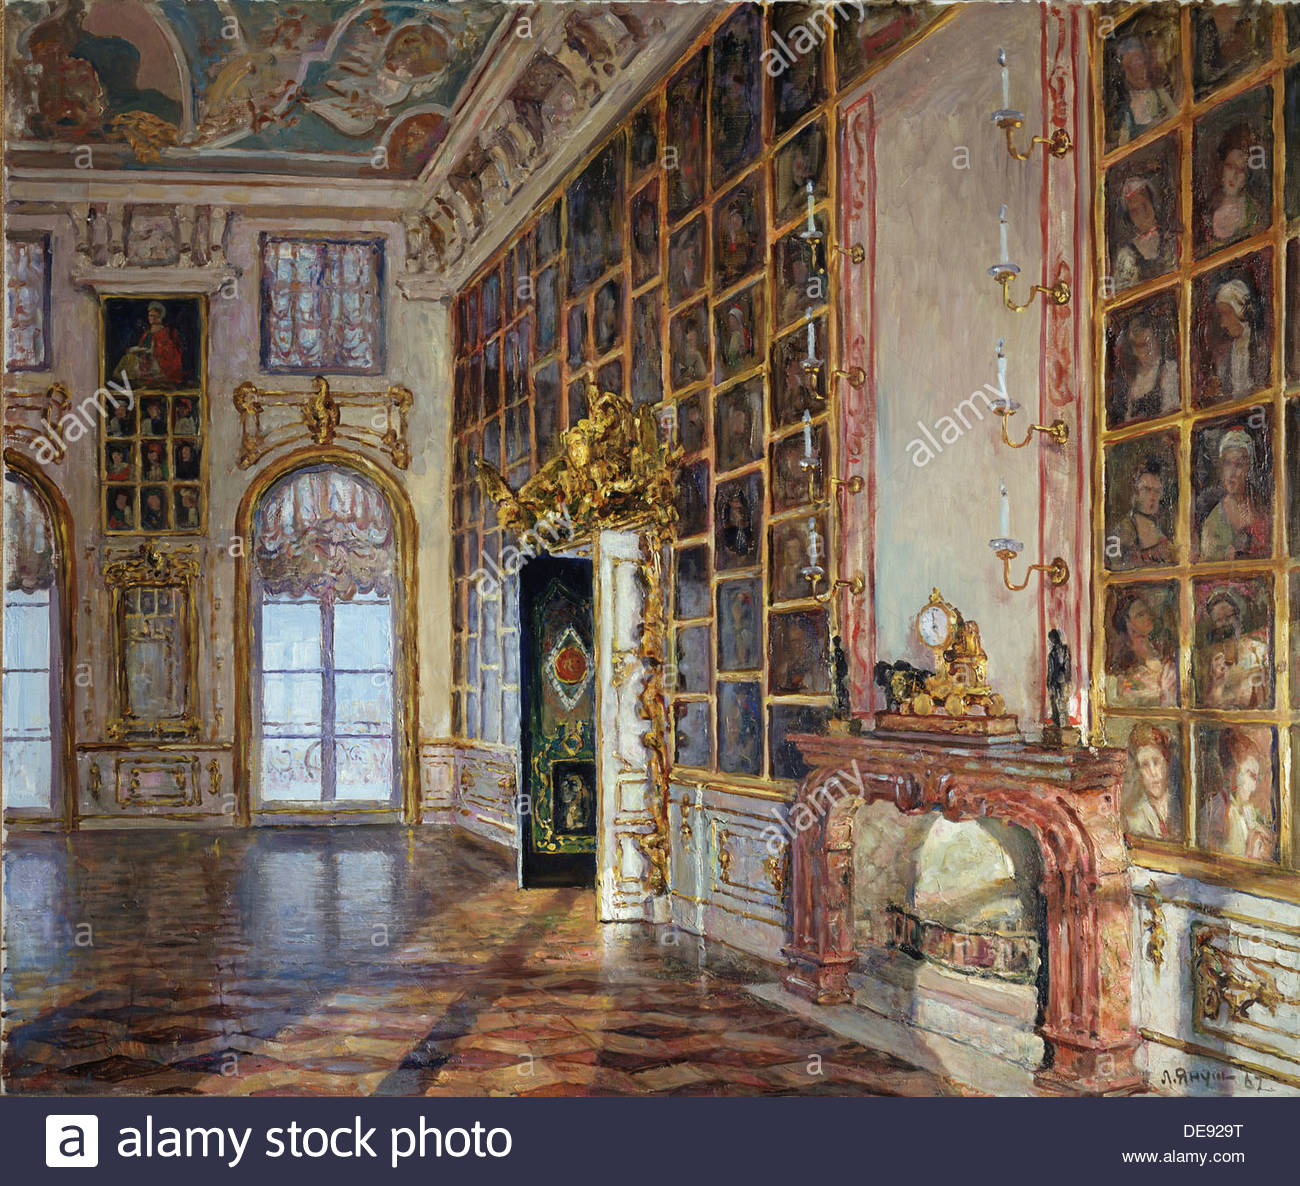 The Portrait Hall in the Great Peterhof Palace, 1967. Artist: Yanush, Leonid Borisovich (1897-1978) - Stock Image